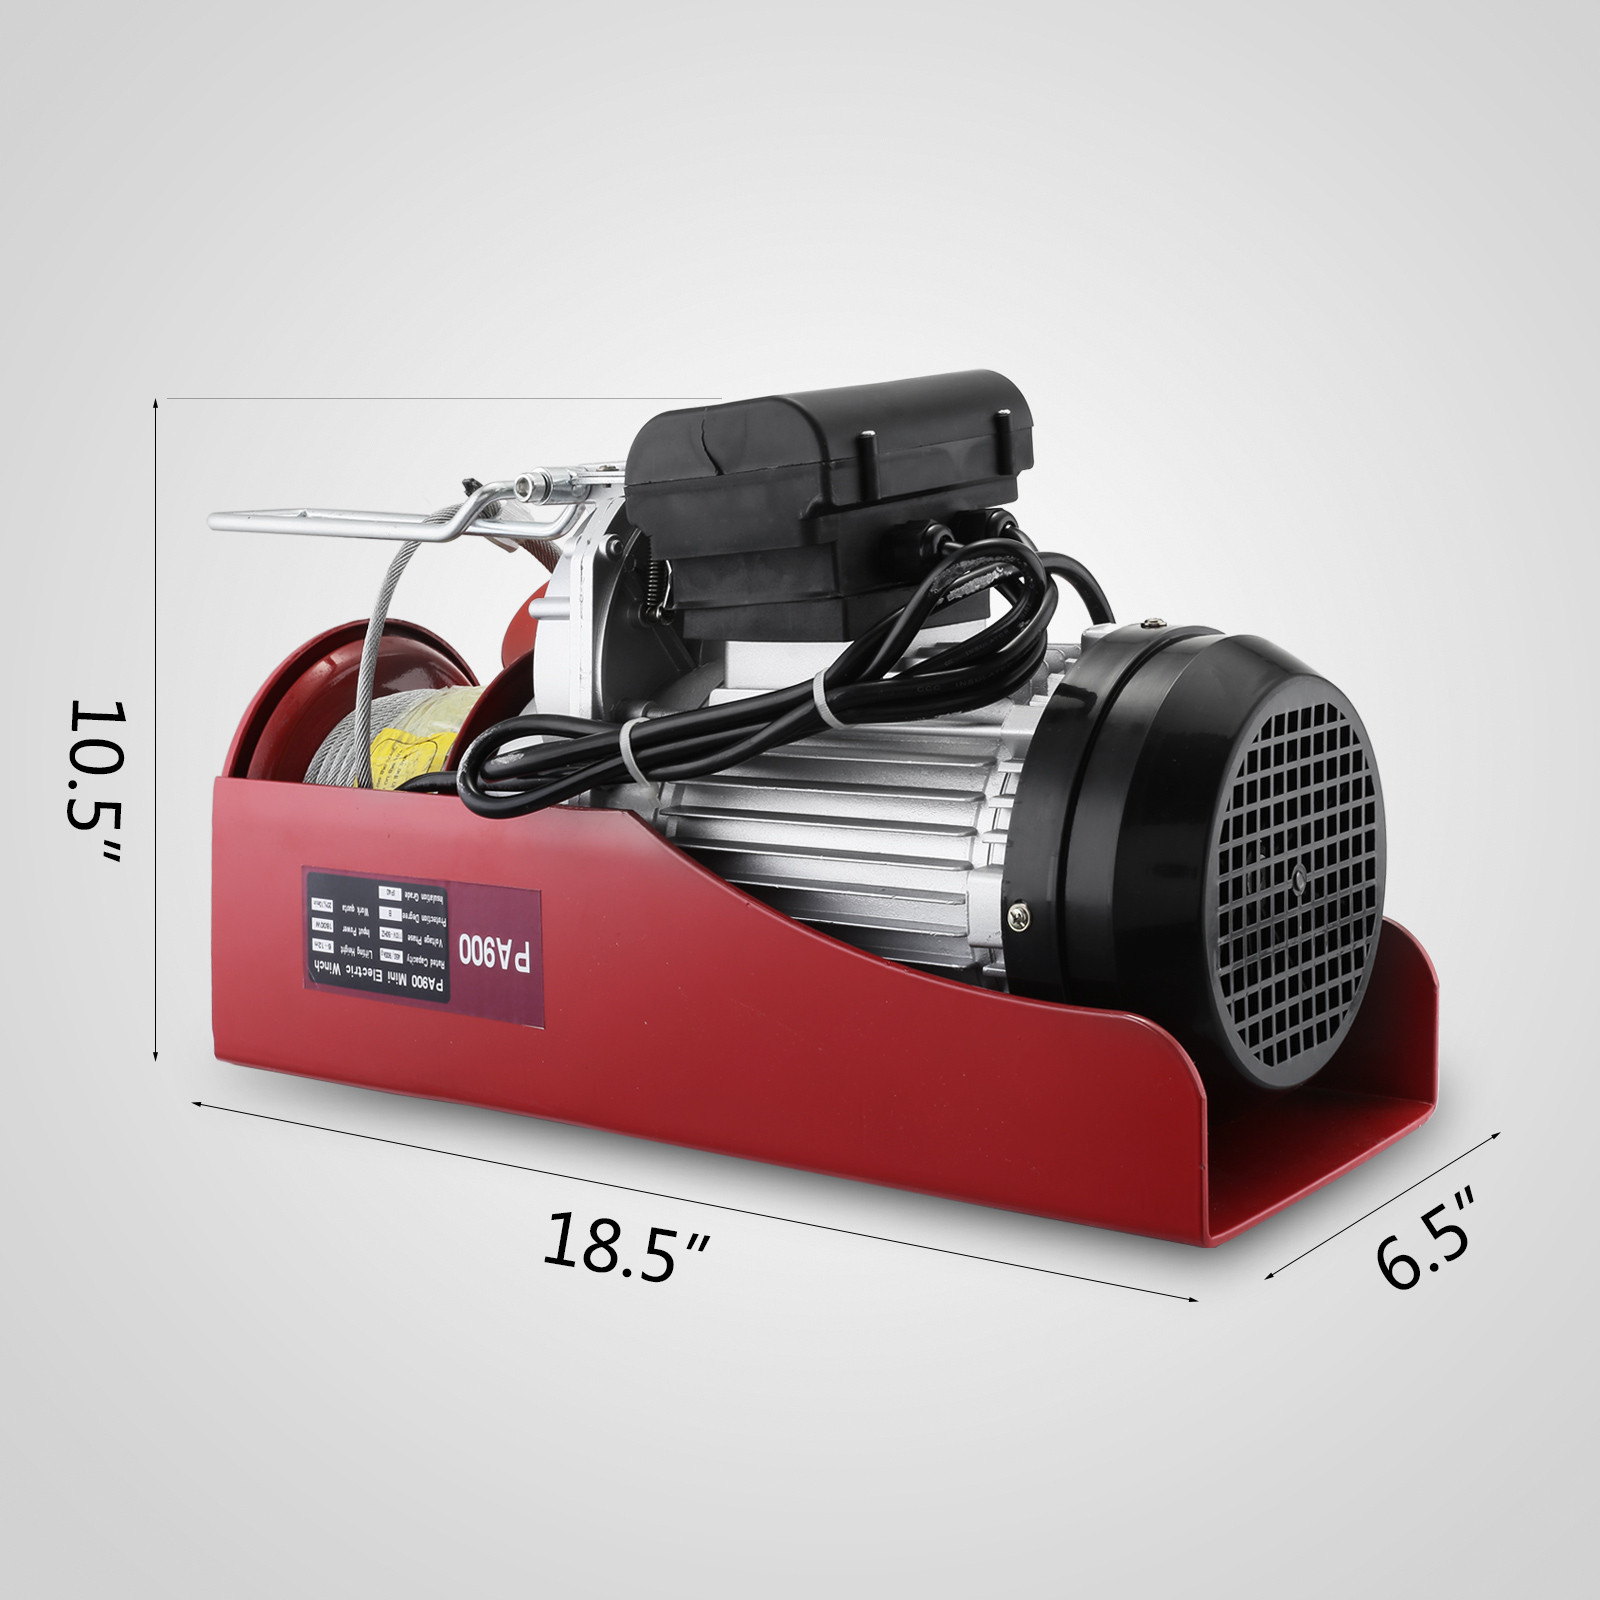 100kg-900kg-Electric-Hoist-Winch-Lifting-Engine-Crane-Cable-Lift-Hook-Garage miniature 62